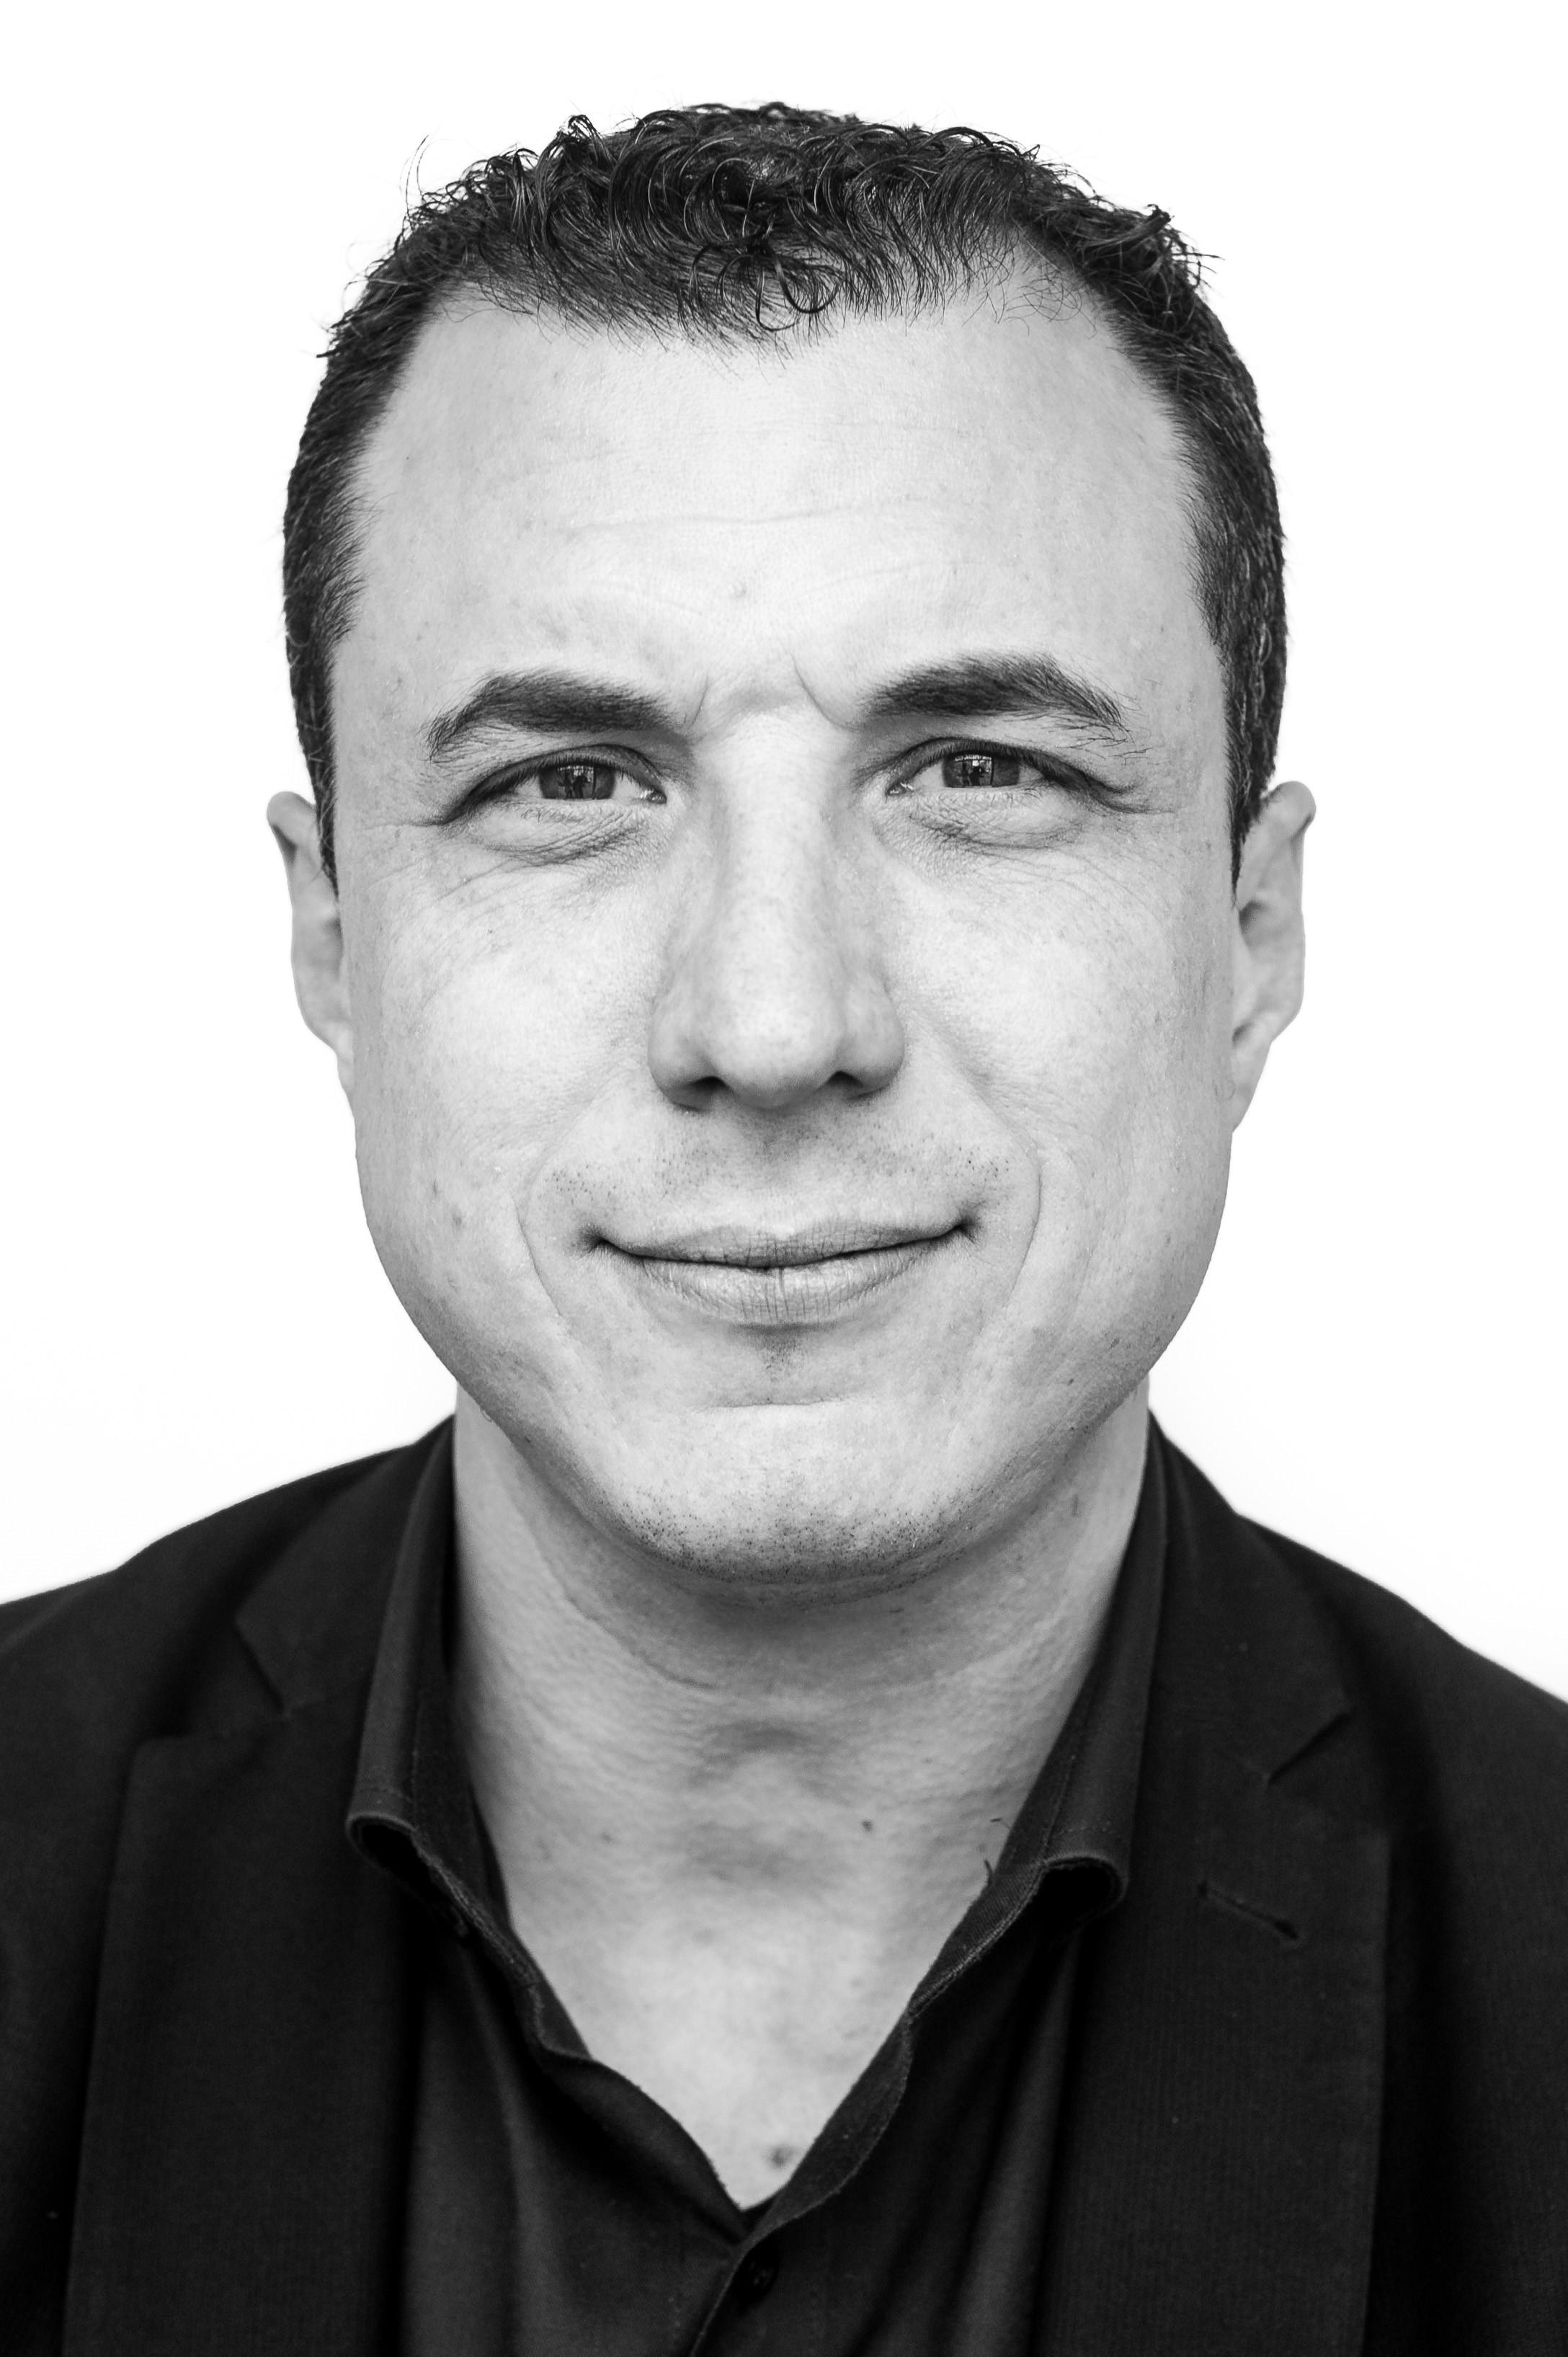 Danick Archambault